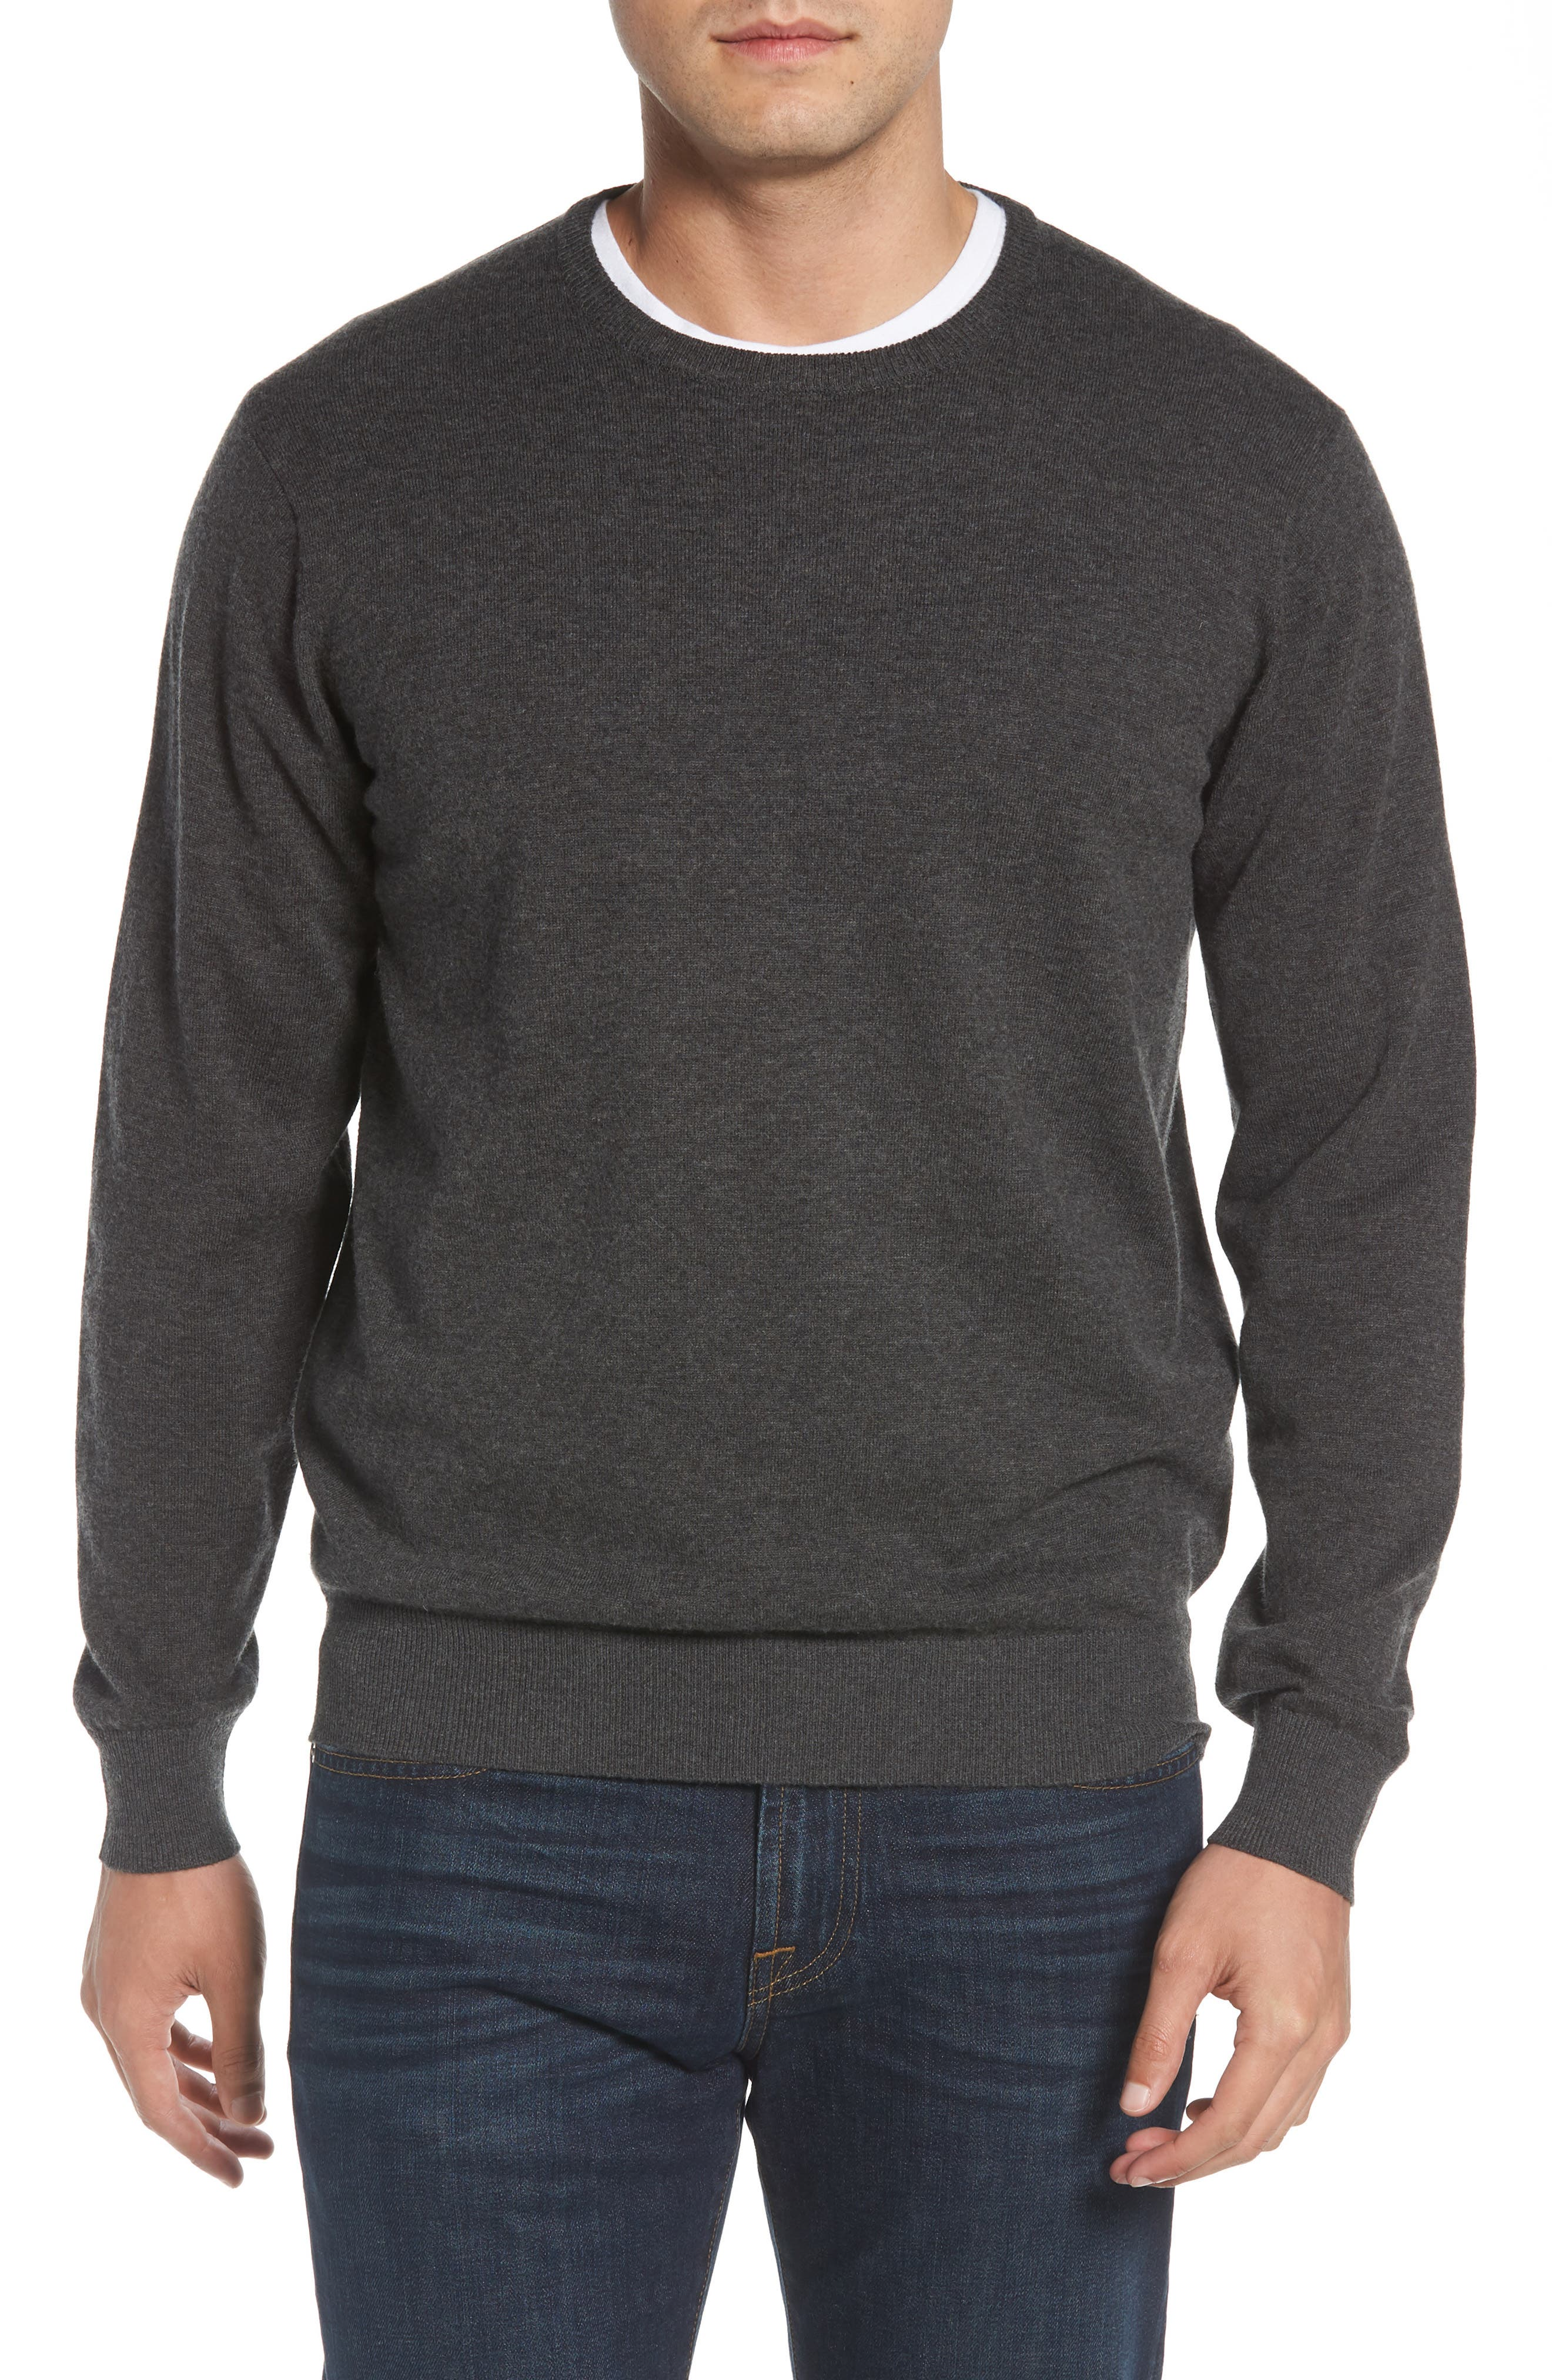 Wool & Cotton Crewneck Sweater,                         Main,                         color, 022